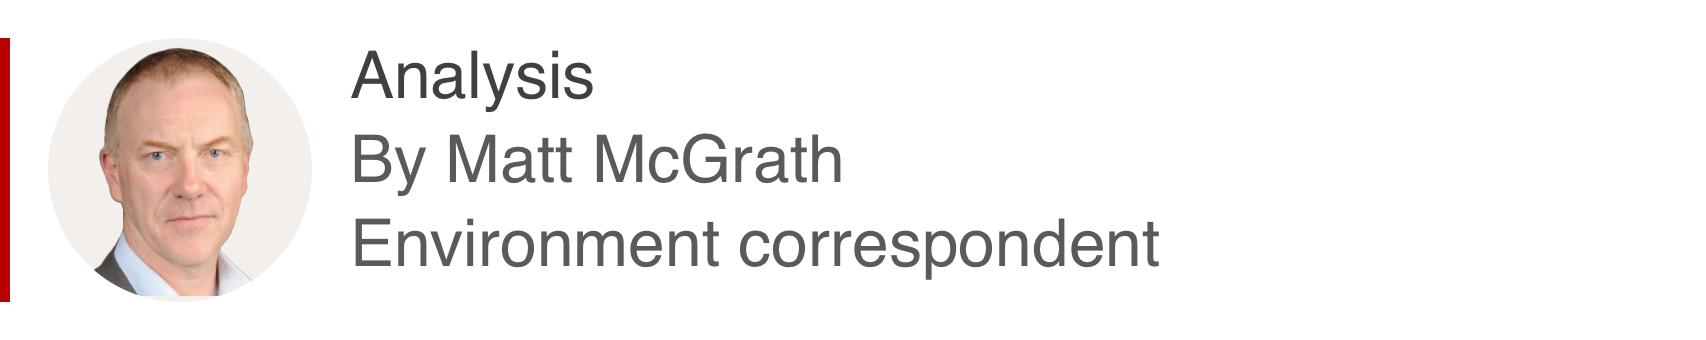 Analysis box by Matt McGrath, environment correspondent